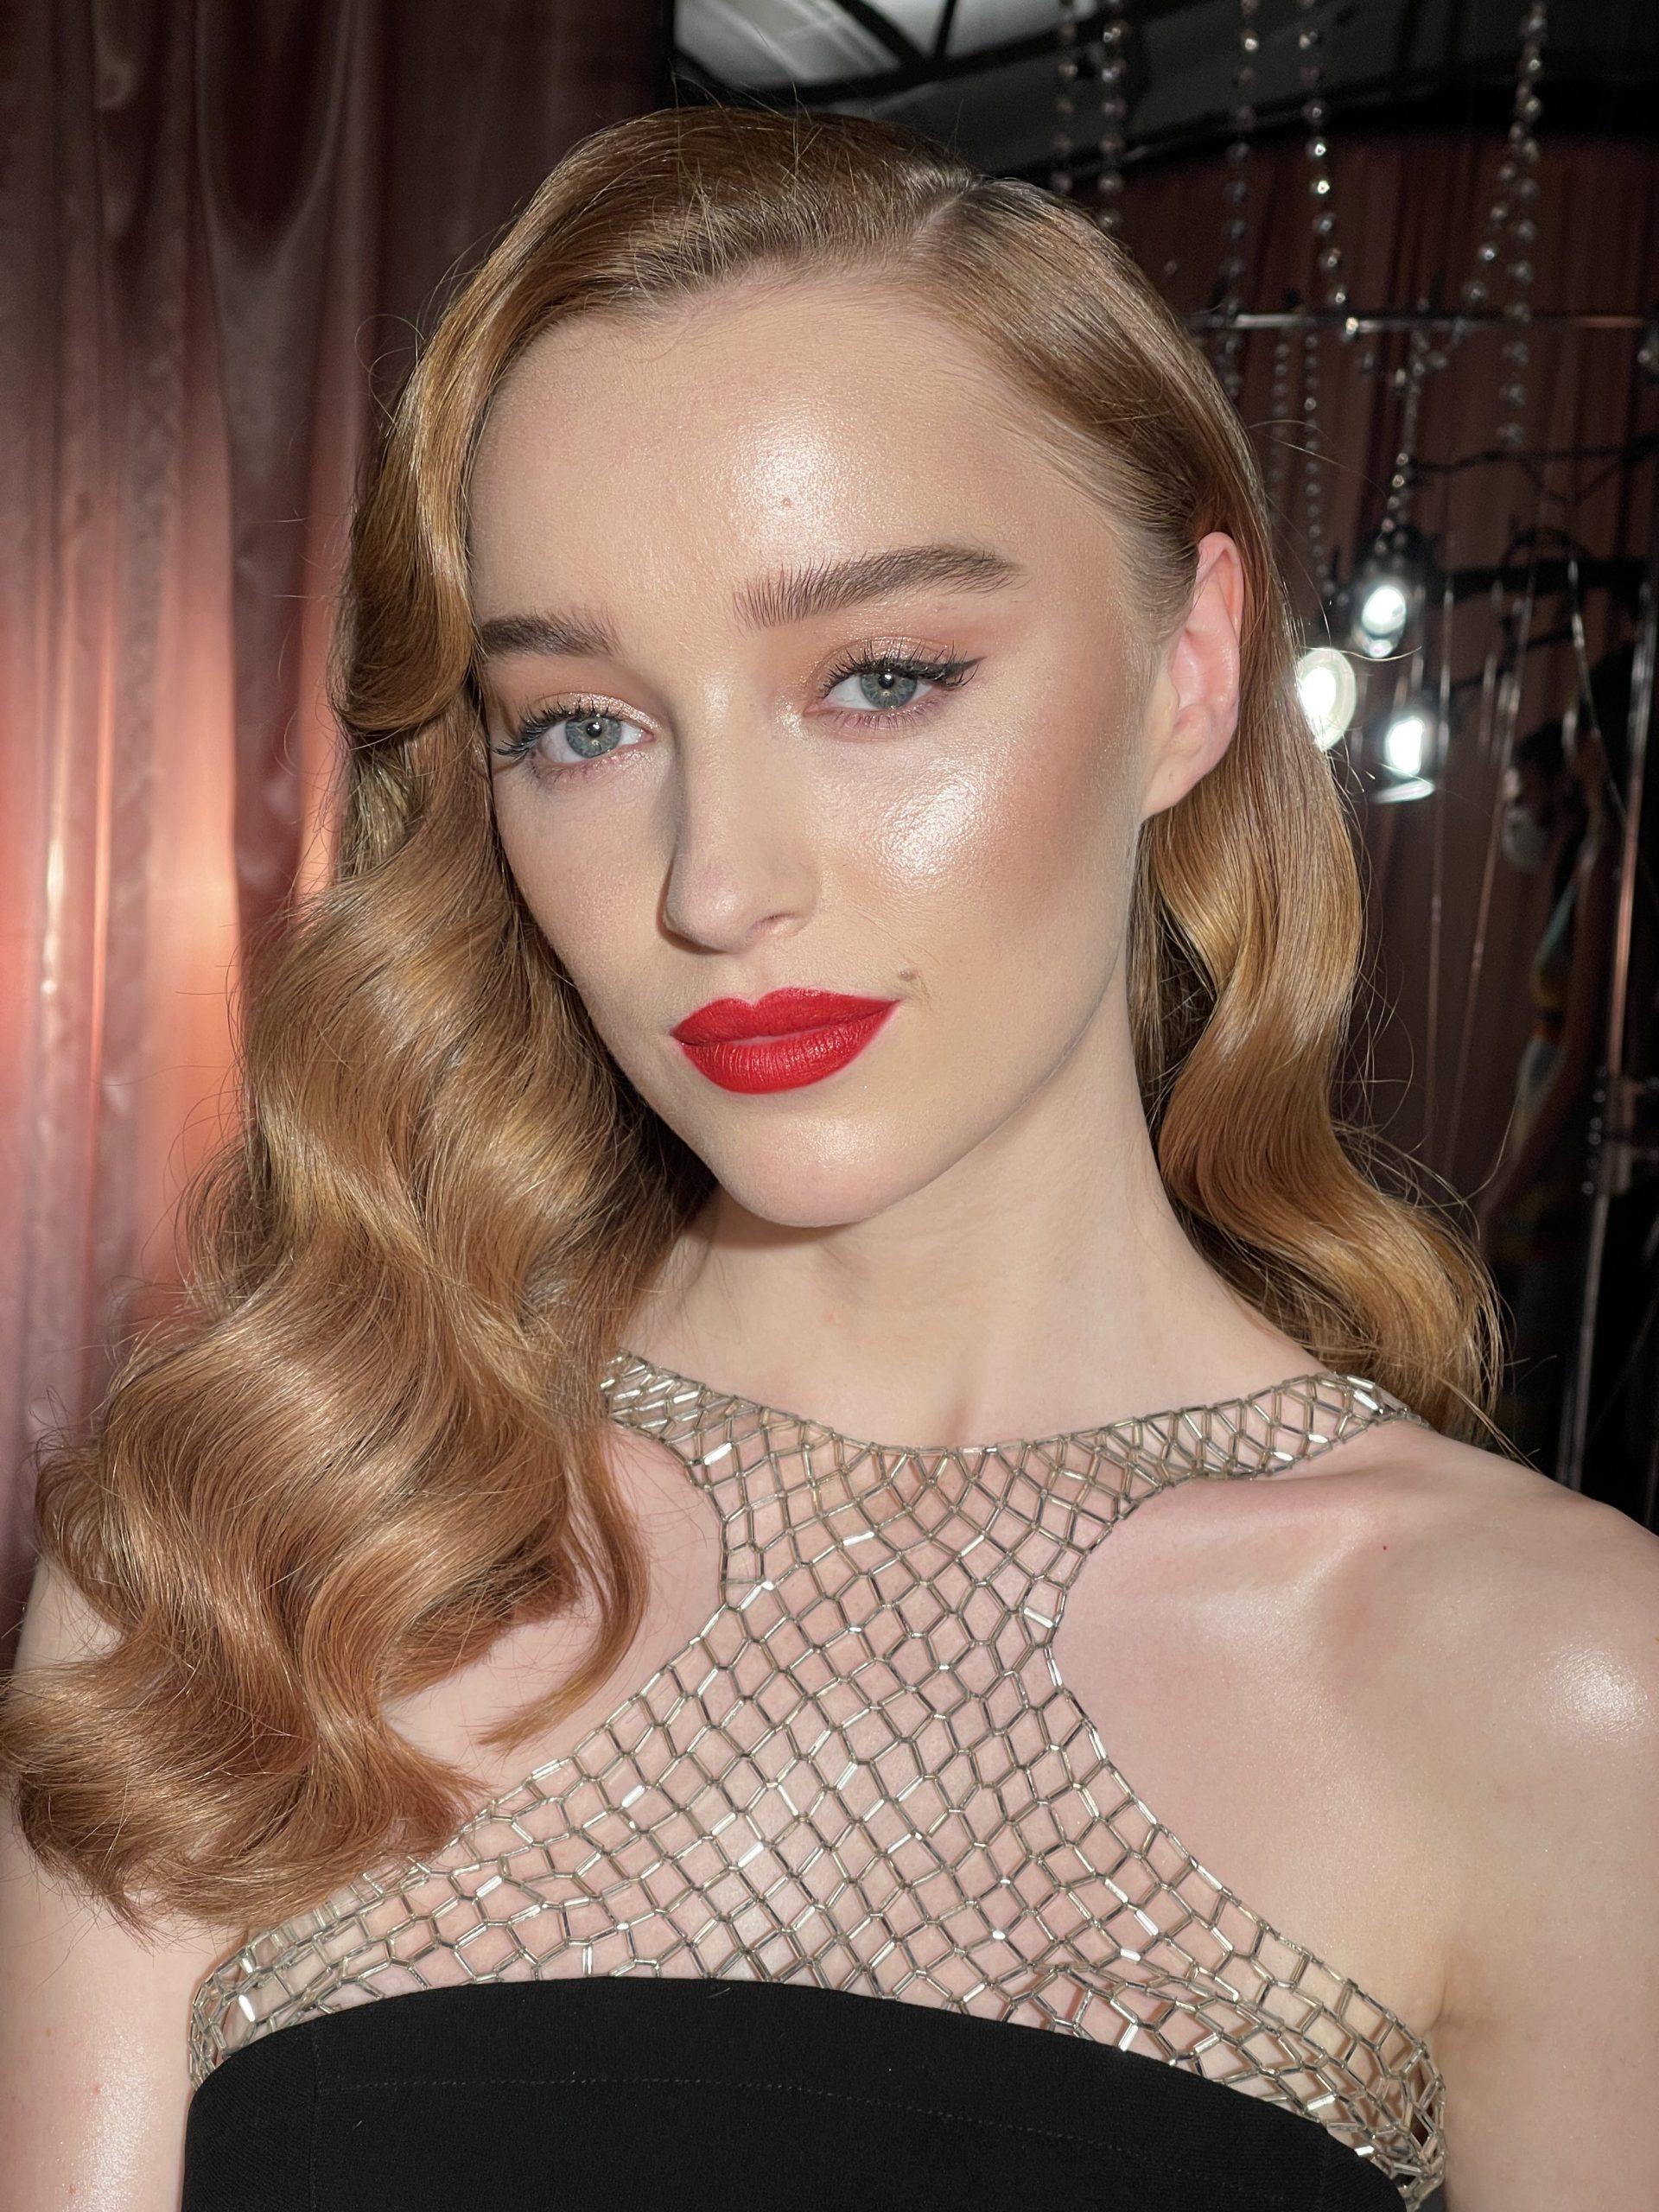 Bridgerton's Phoebe Dynevor for Charlotte Tilbury + More Fashion News